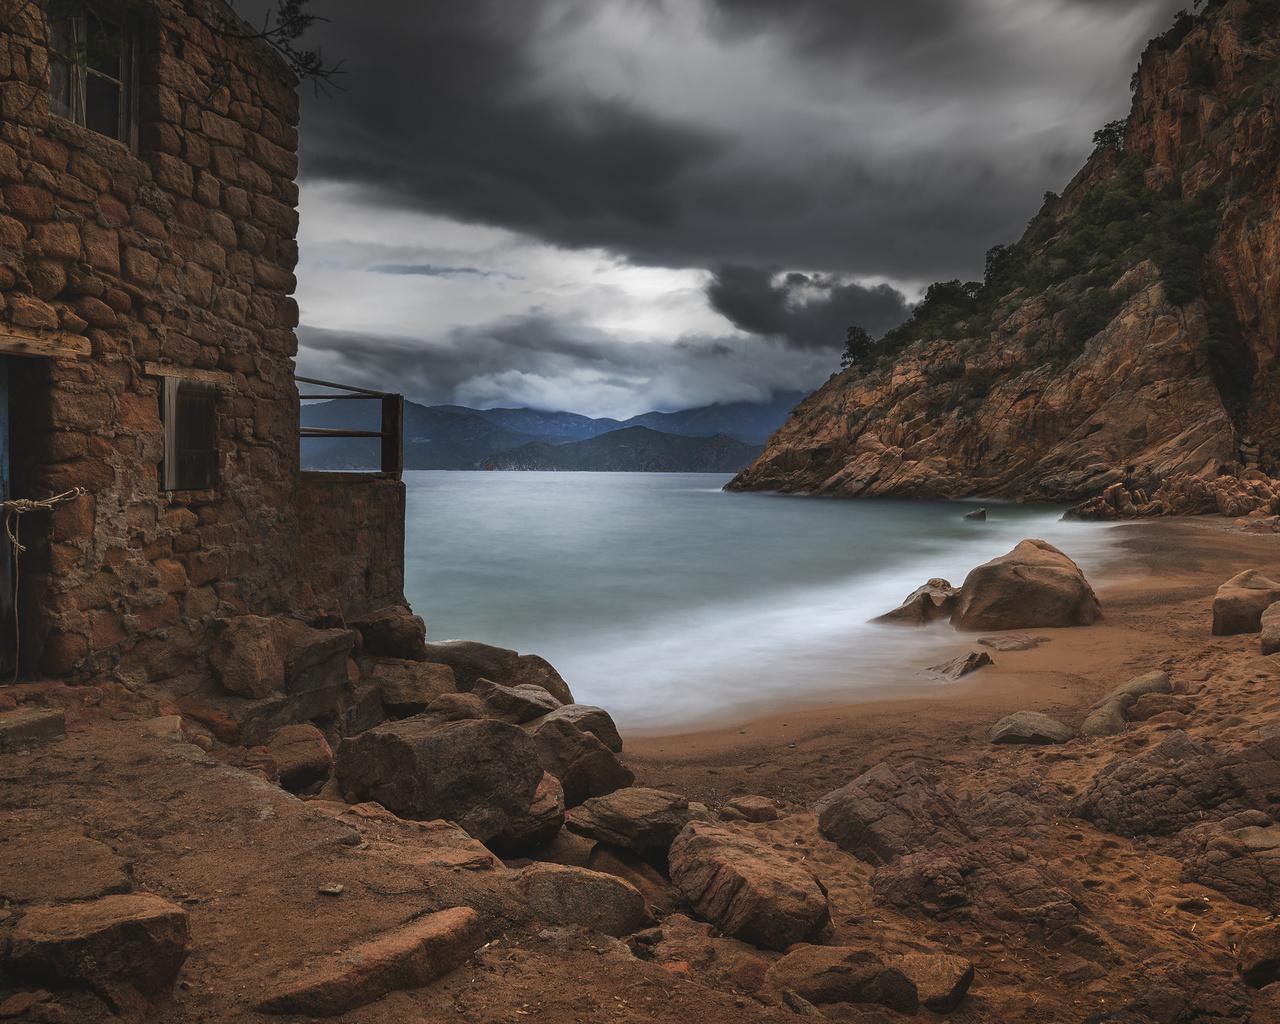 corsica, корсика, природа, пейзаж, камни, скалы, берег, море, тучи, дом, развалины